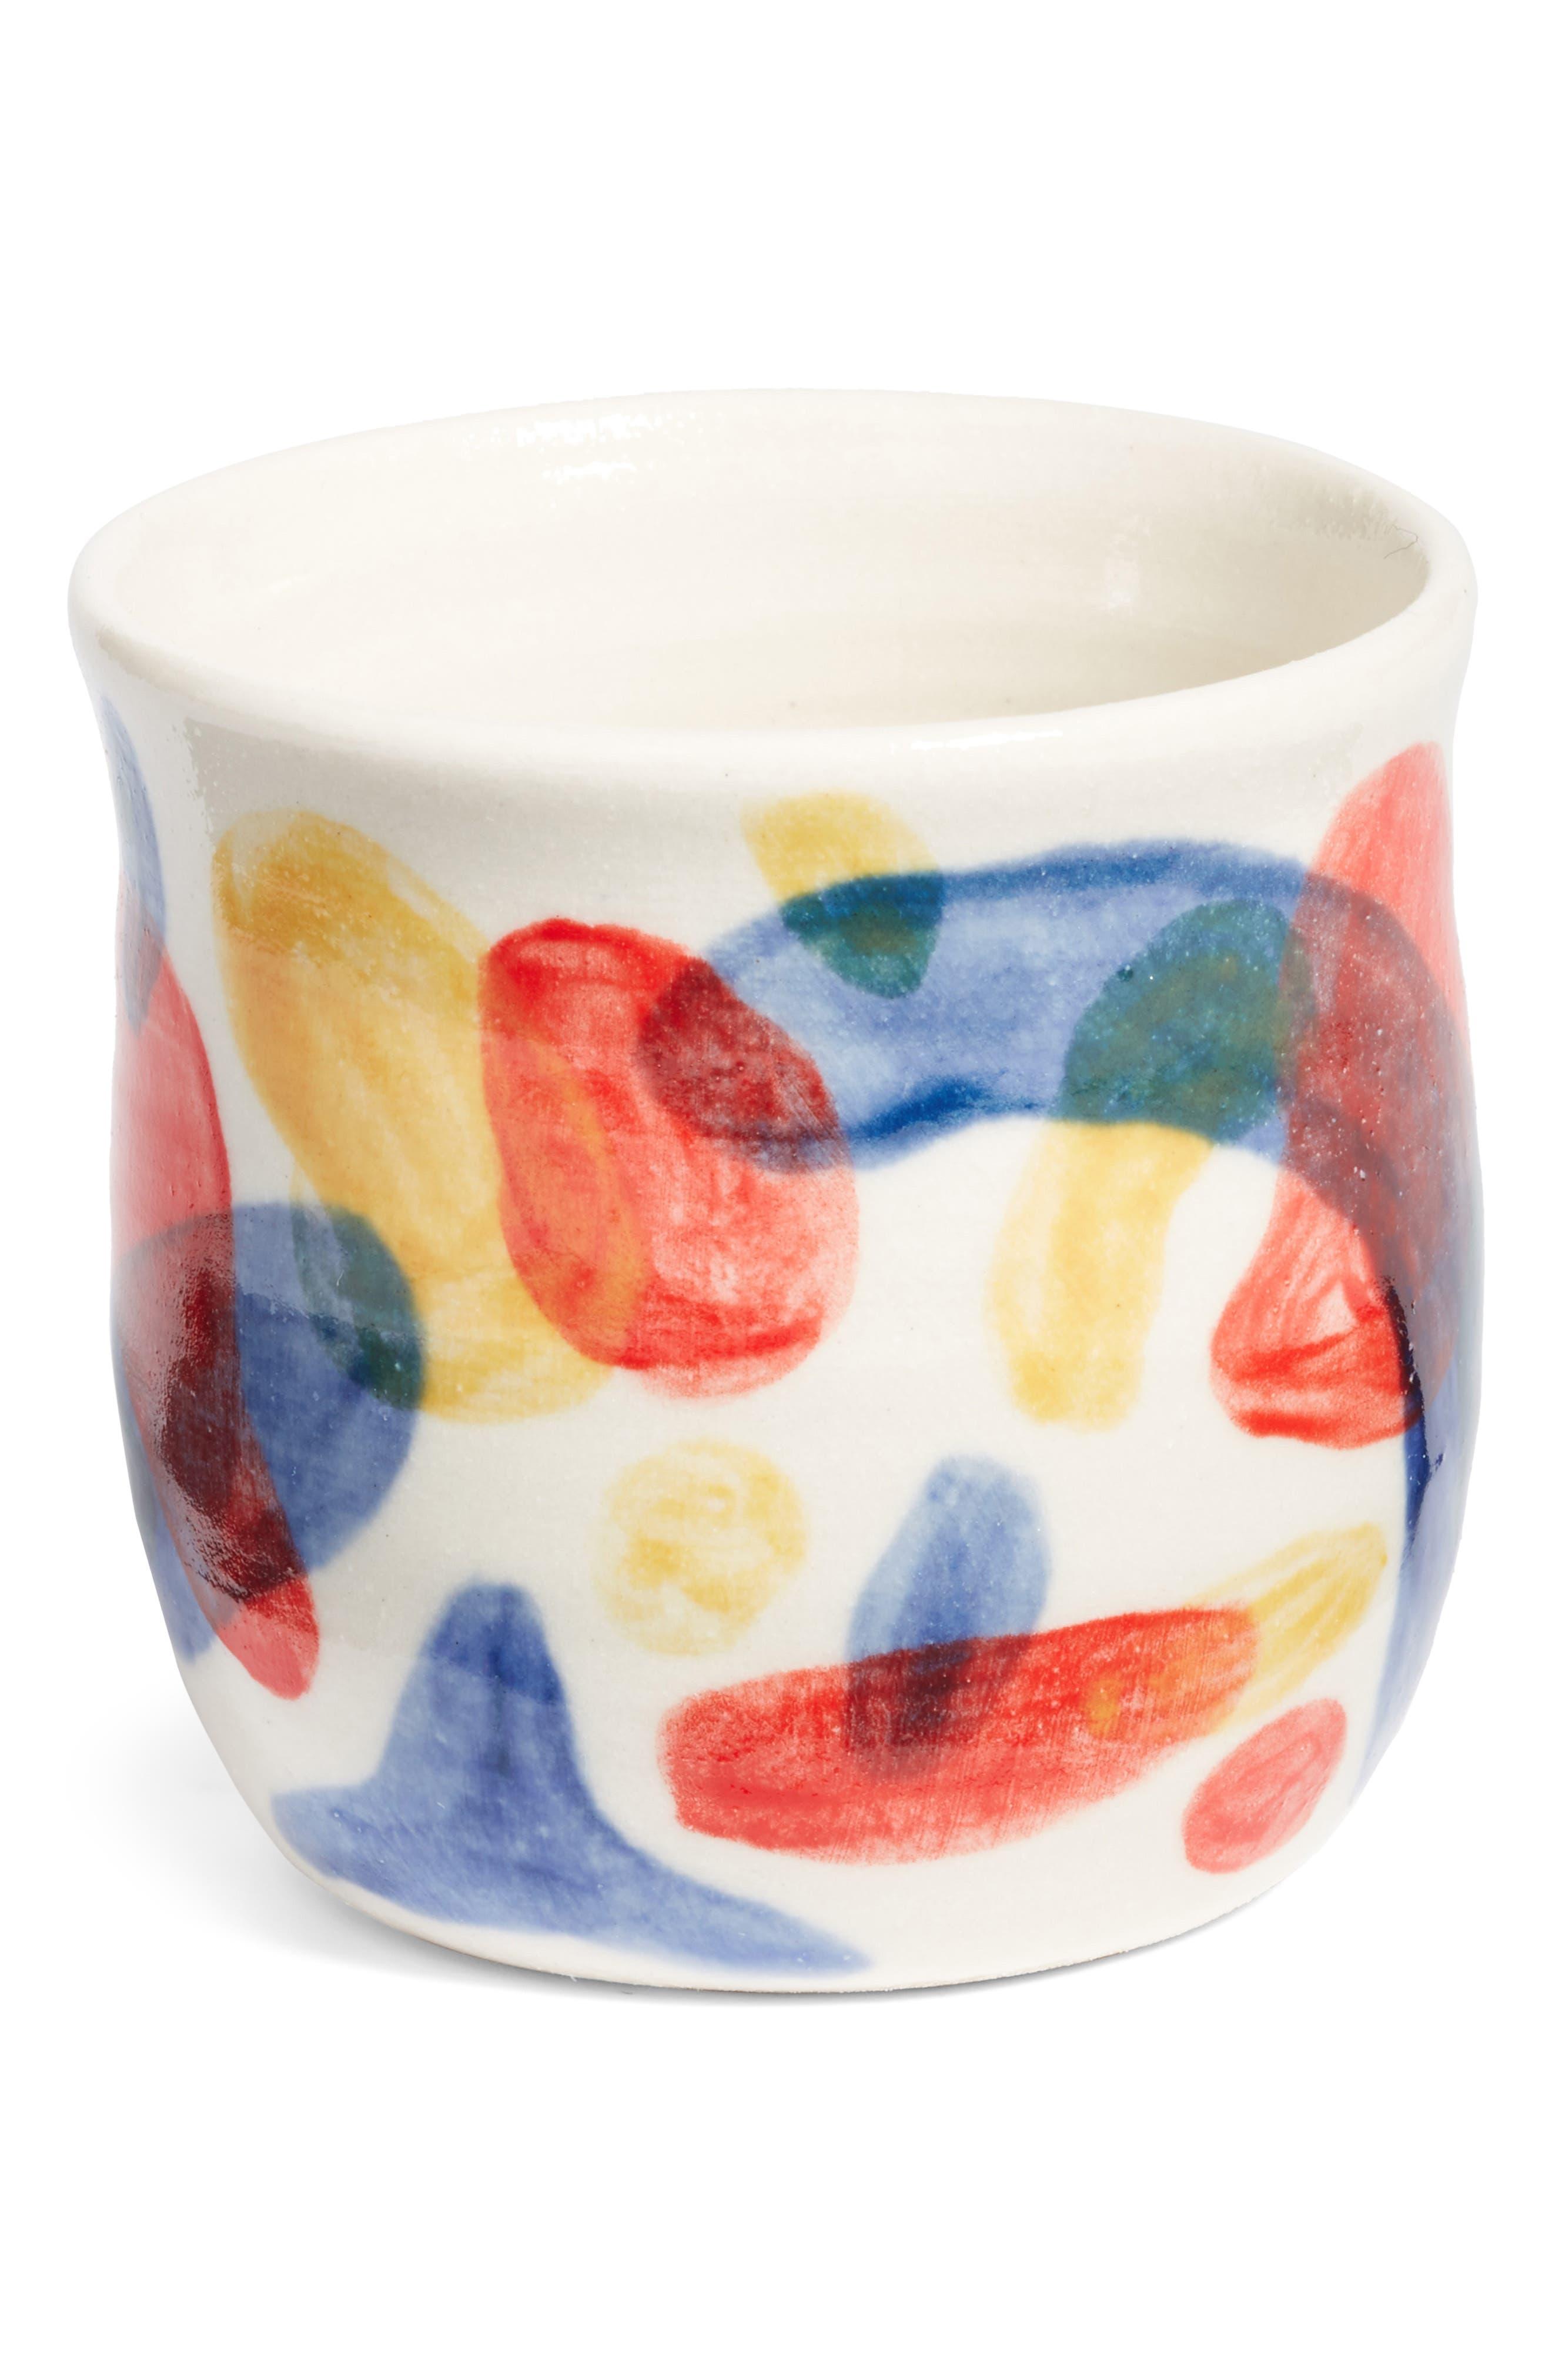 Primary Deco Bitty Pot,                         Main,                         color, Blobs